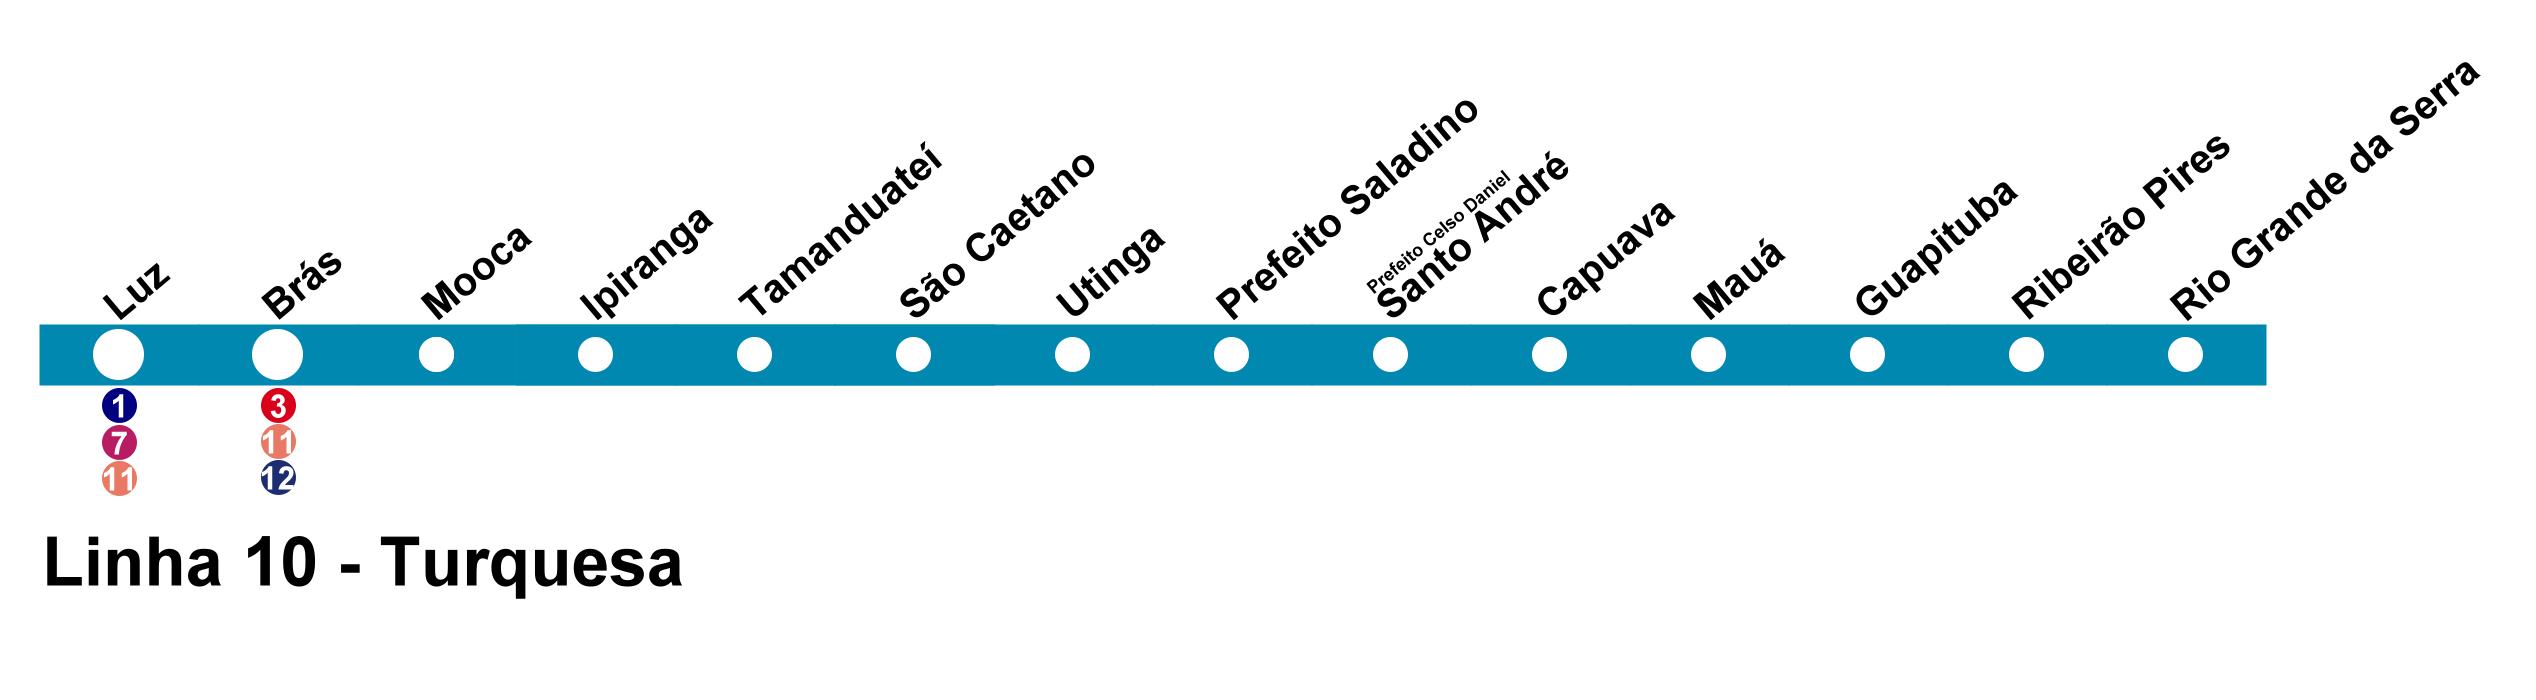 Linha_10-Turquesa.PNG